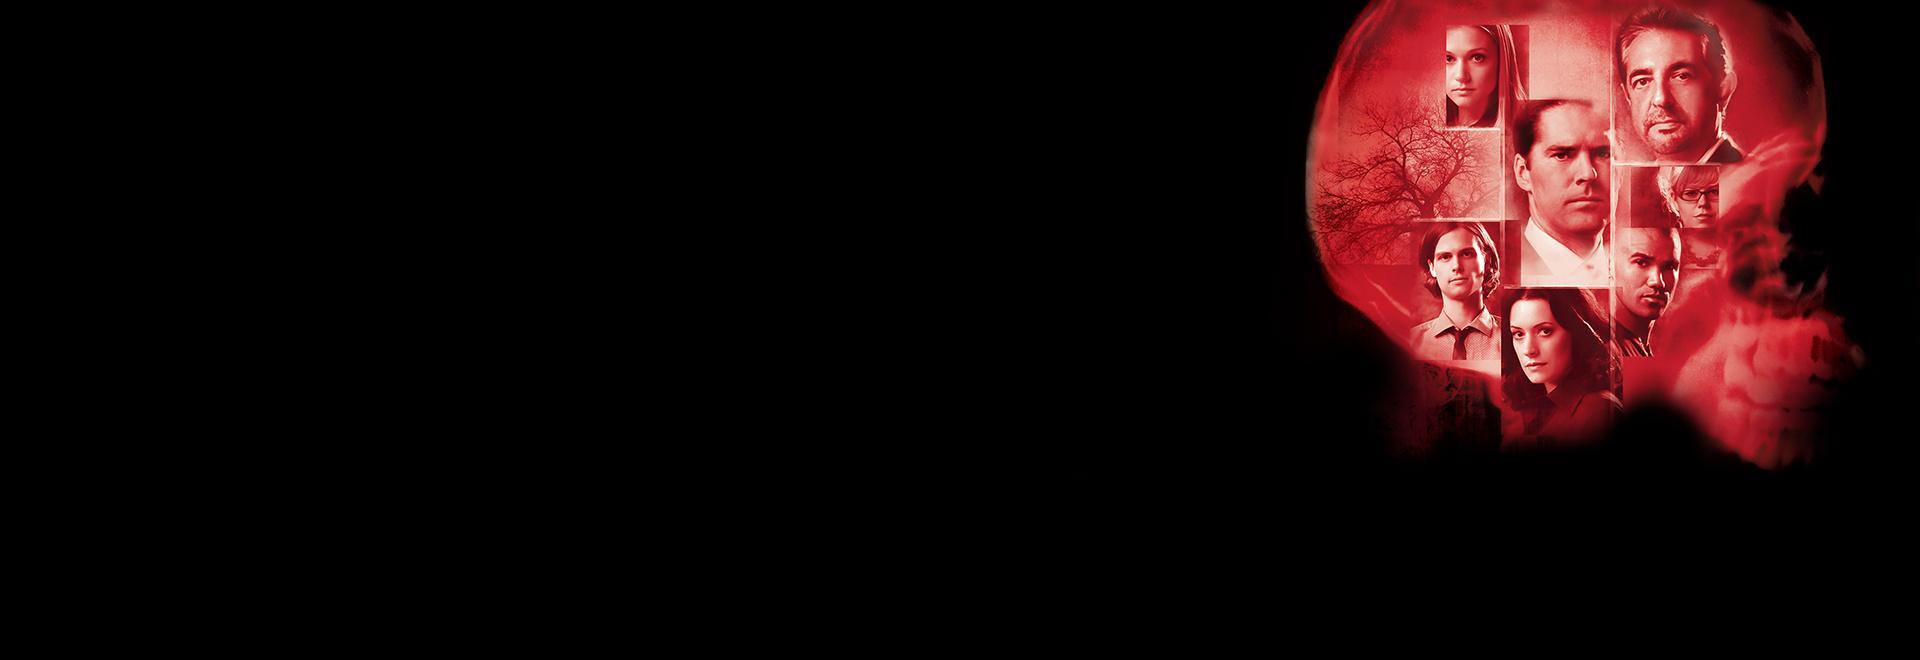 Bambini nel buio